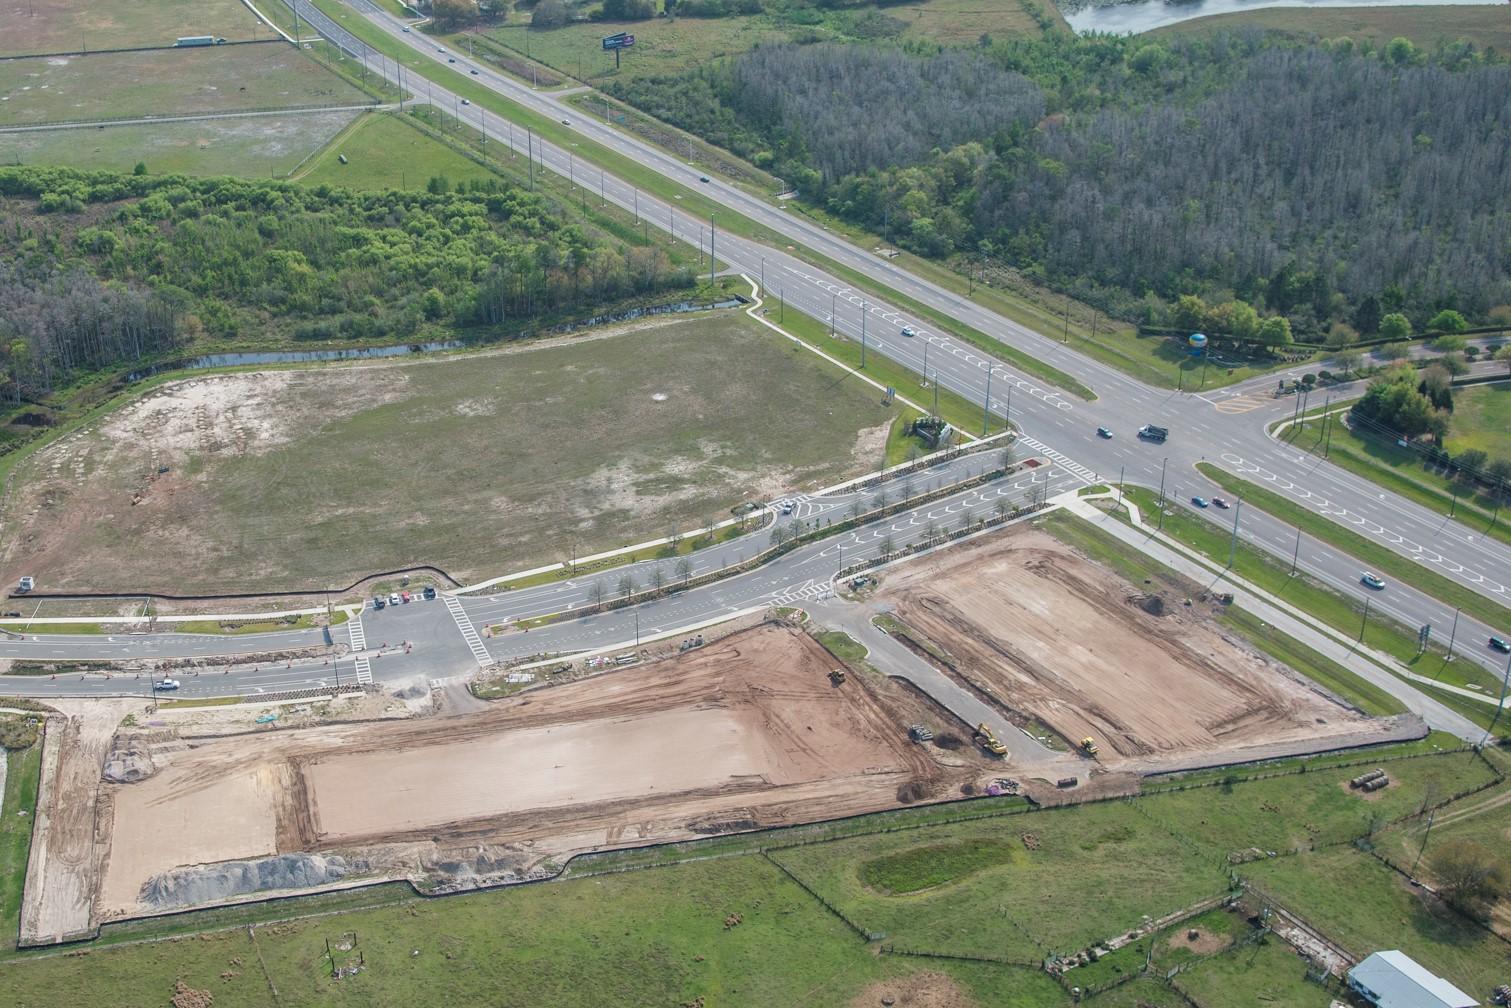 Bexley Property Phase A 3-7-17 01.jpg